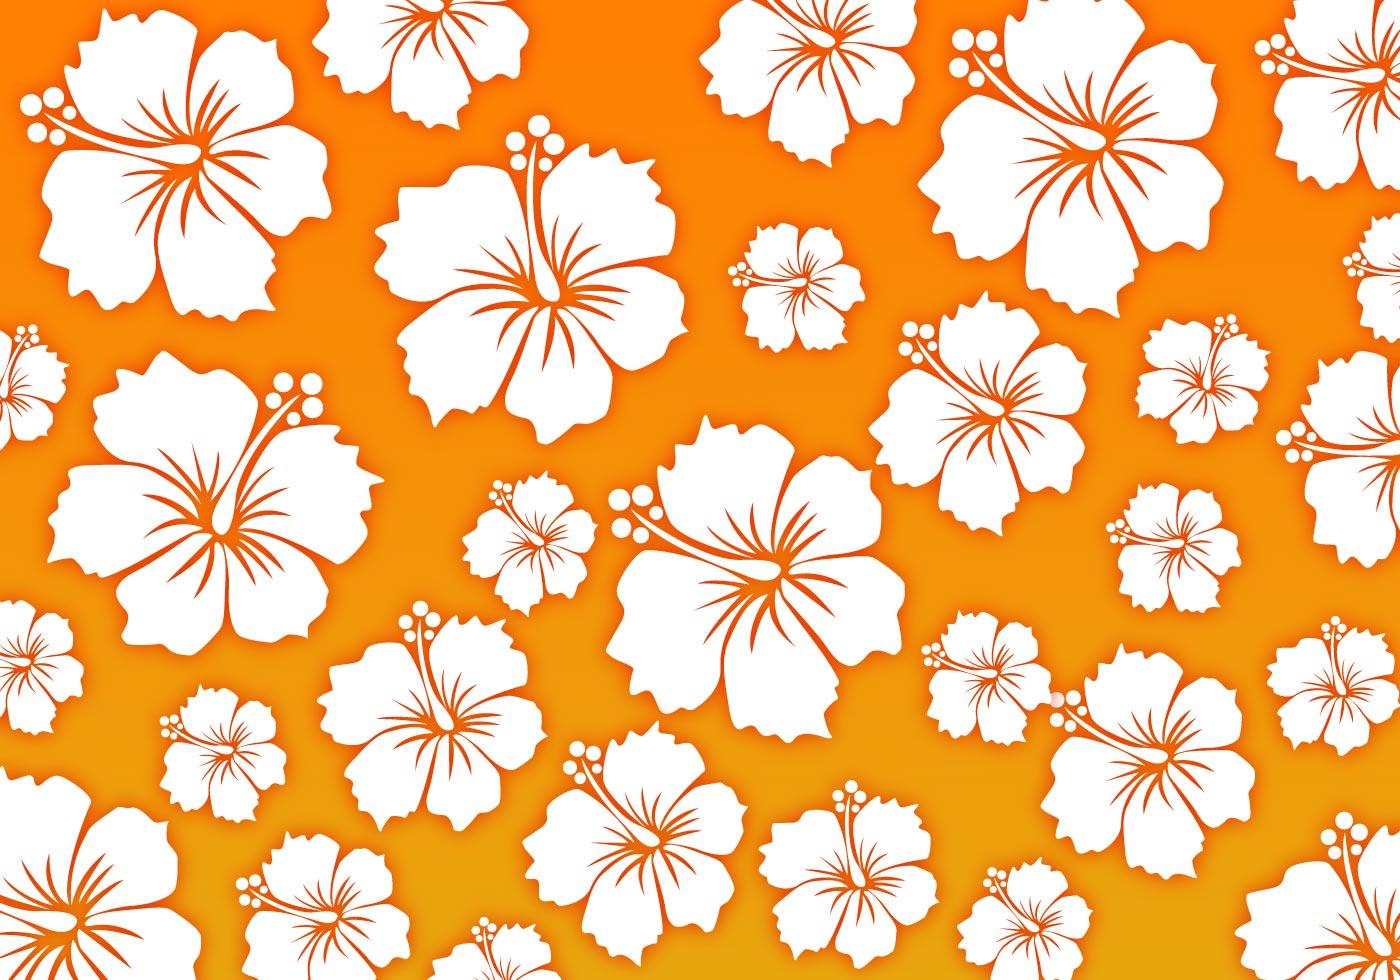 free hawaii background vector download free vector art